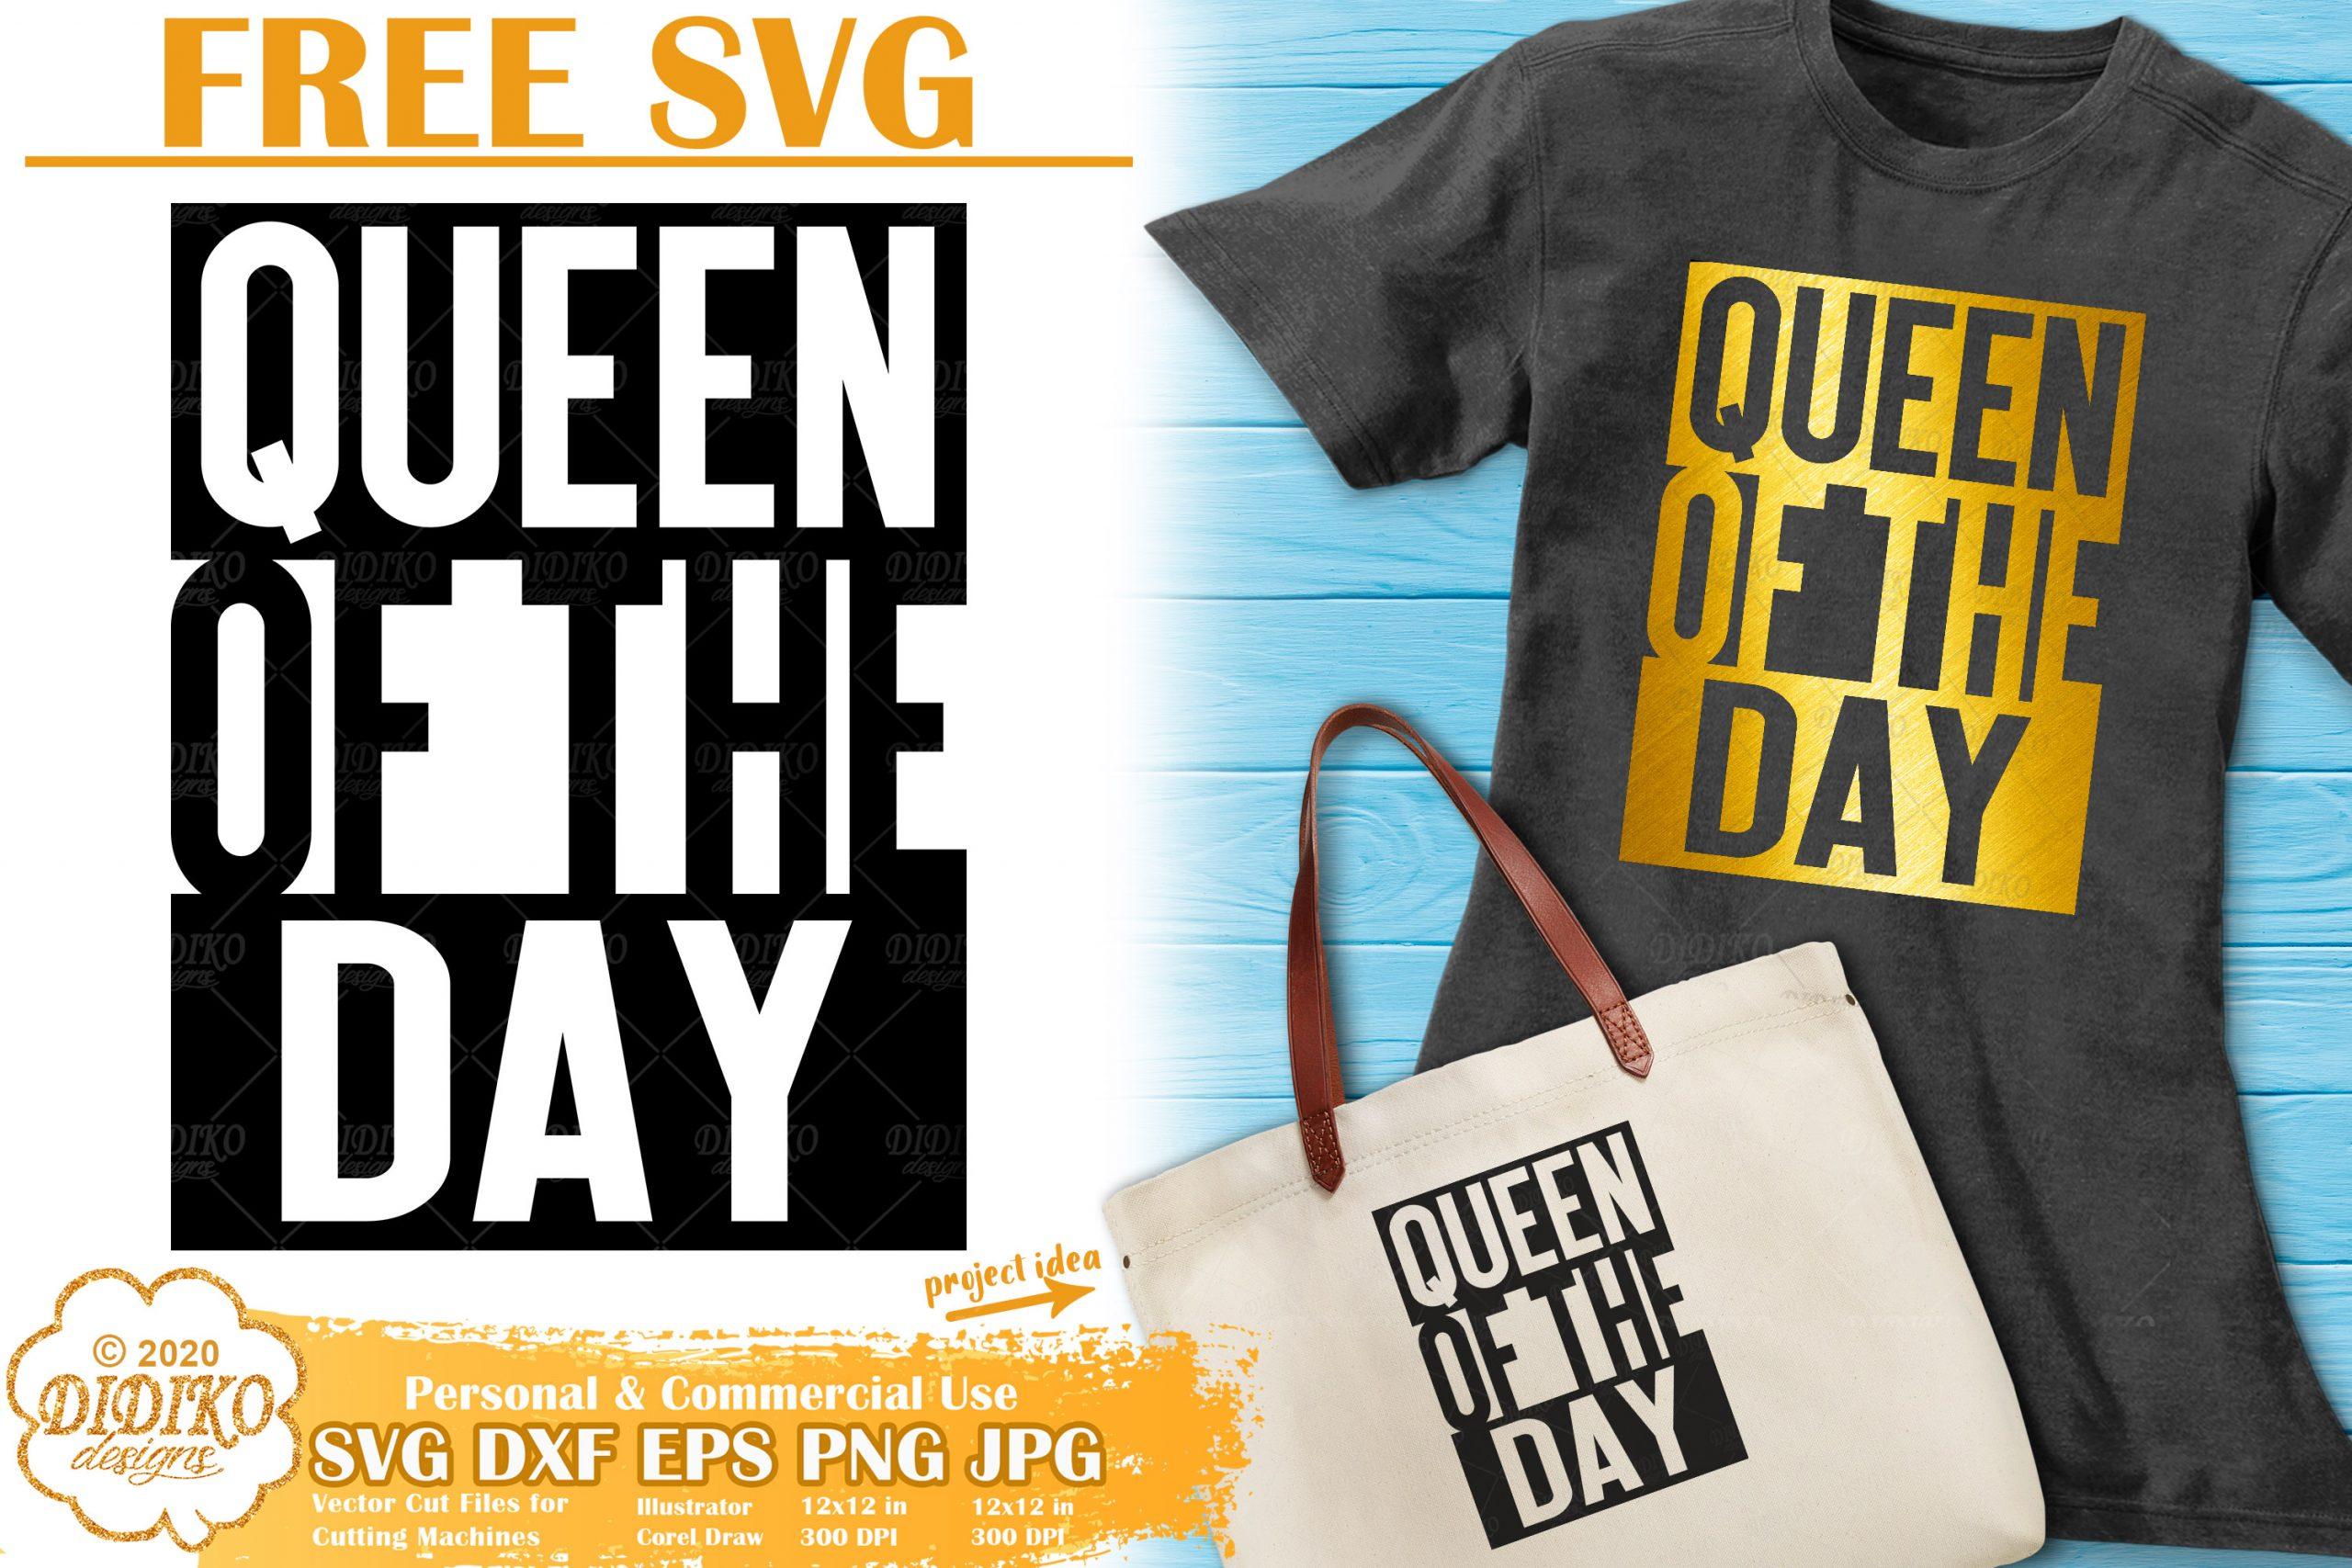 Download Black Woman Free SVG #1 | Black Queen Svg | Afro svg ...